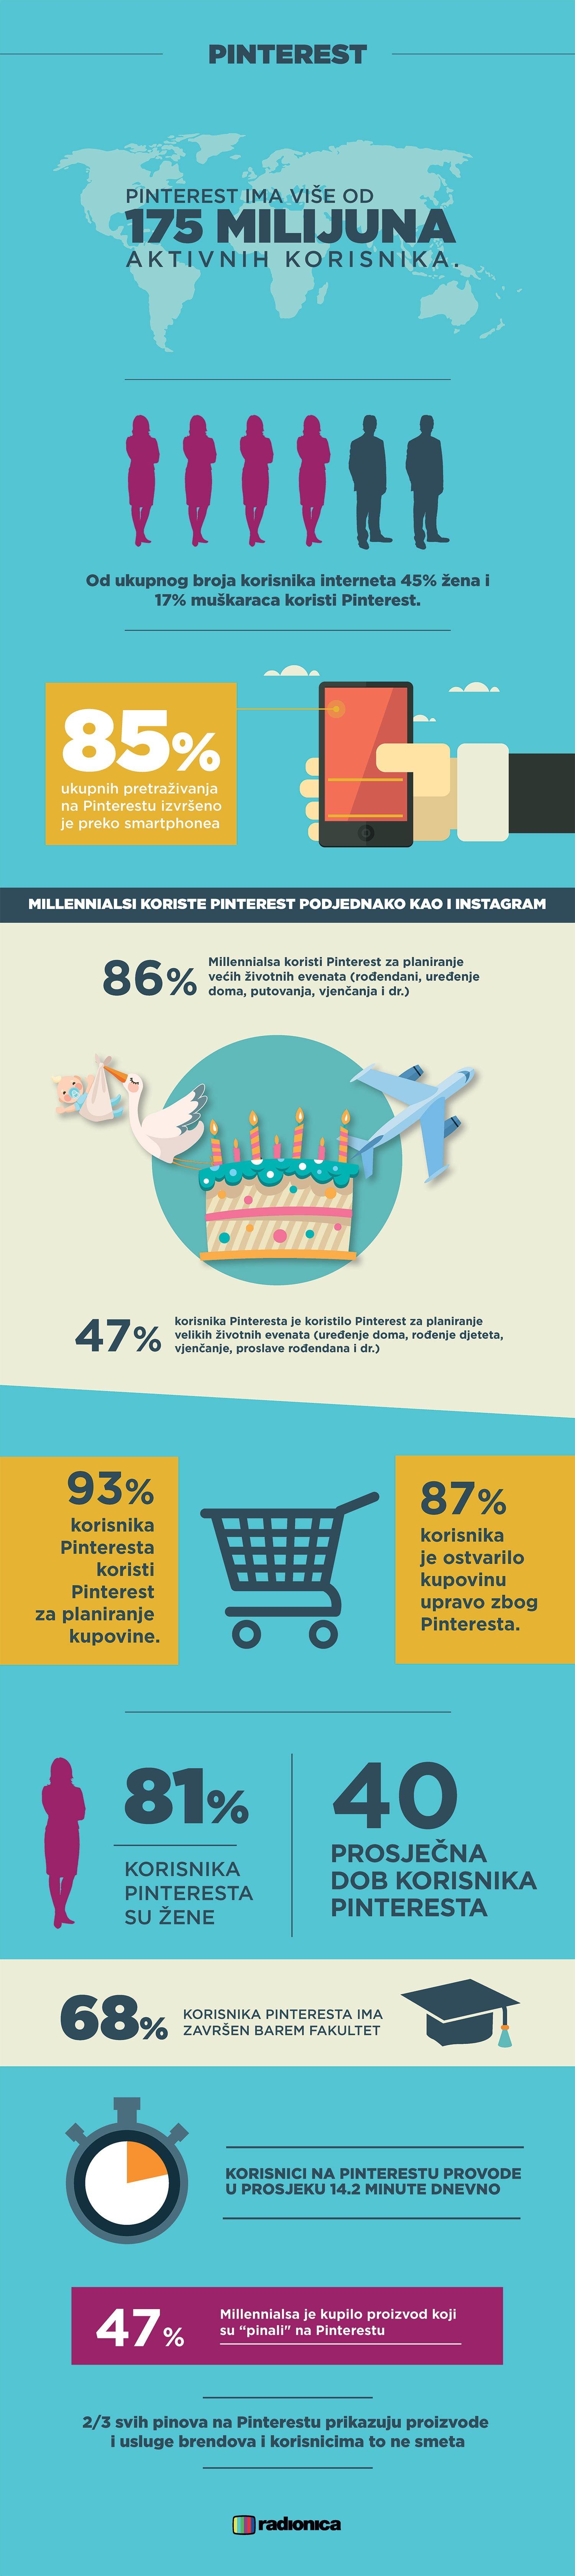 pinterest-infografika